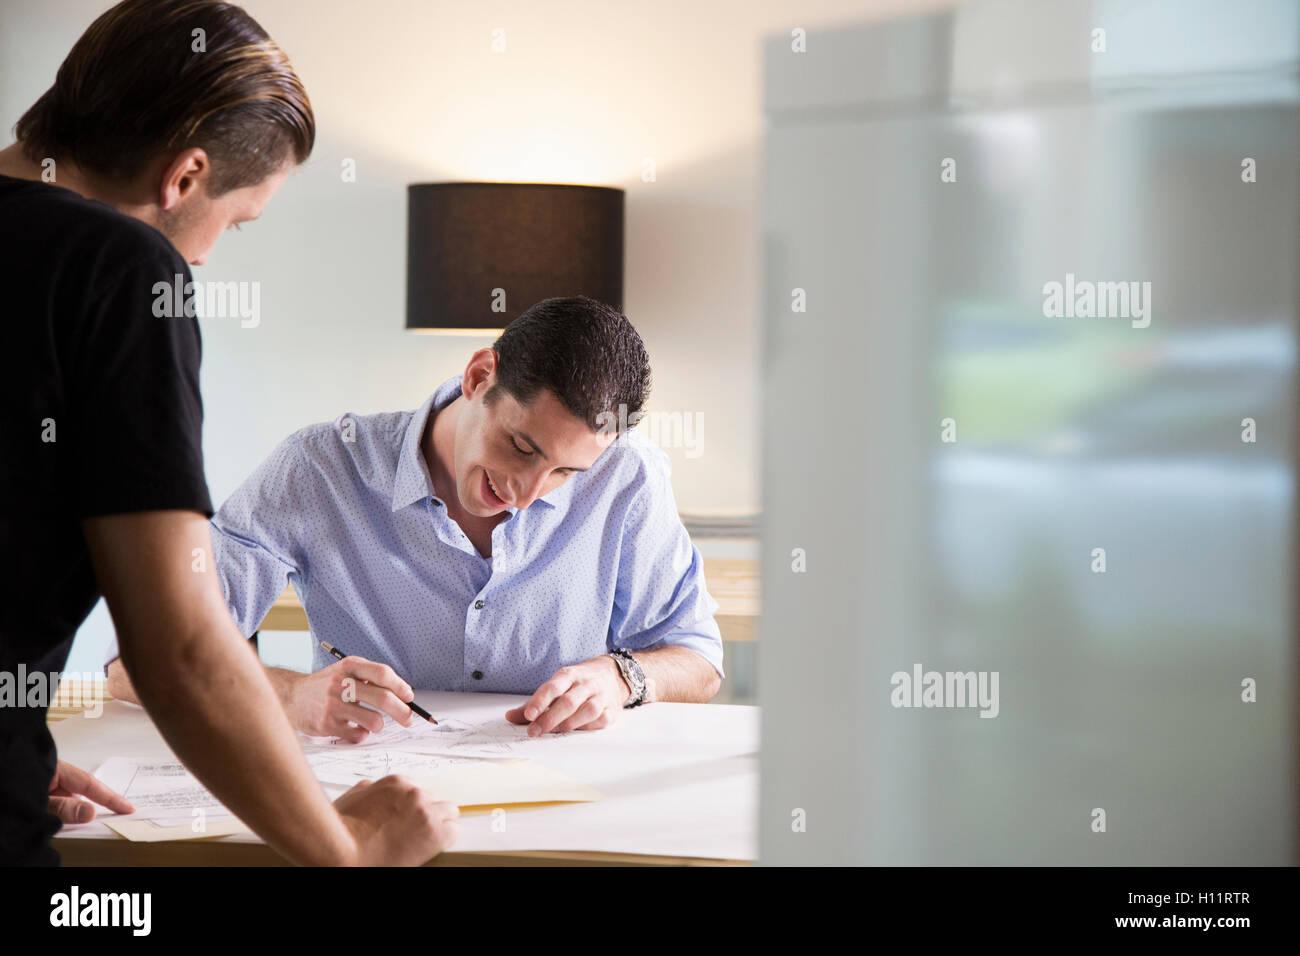 Dos hombres que trabajaban en una oficina moderna Foto de stock